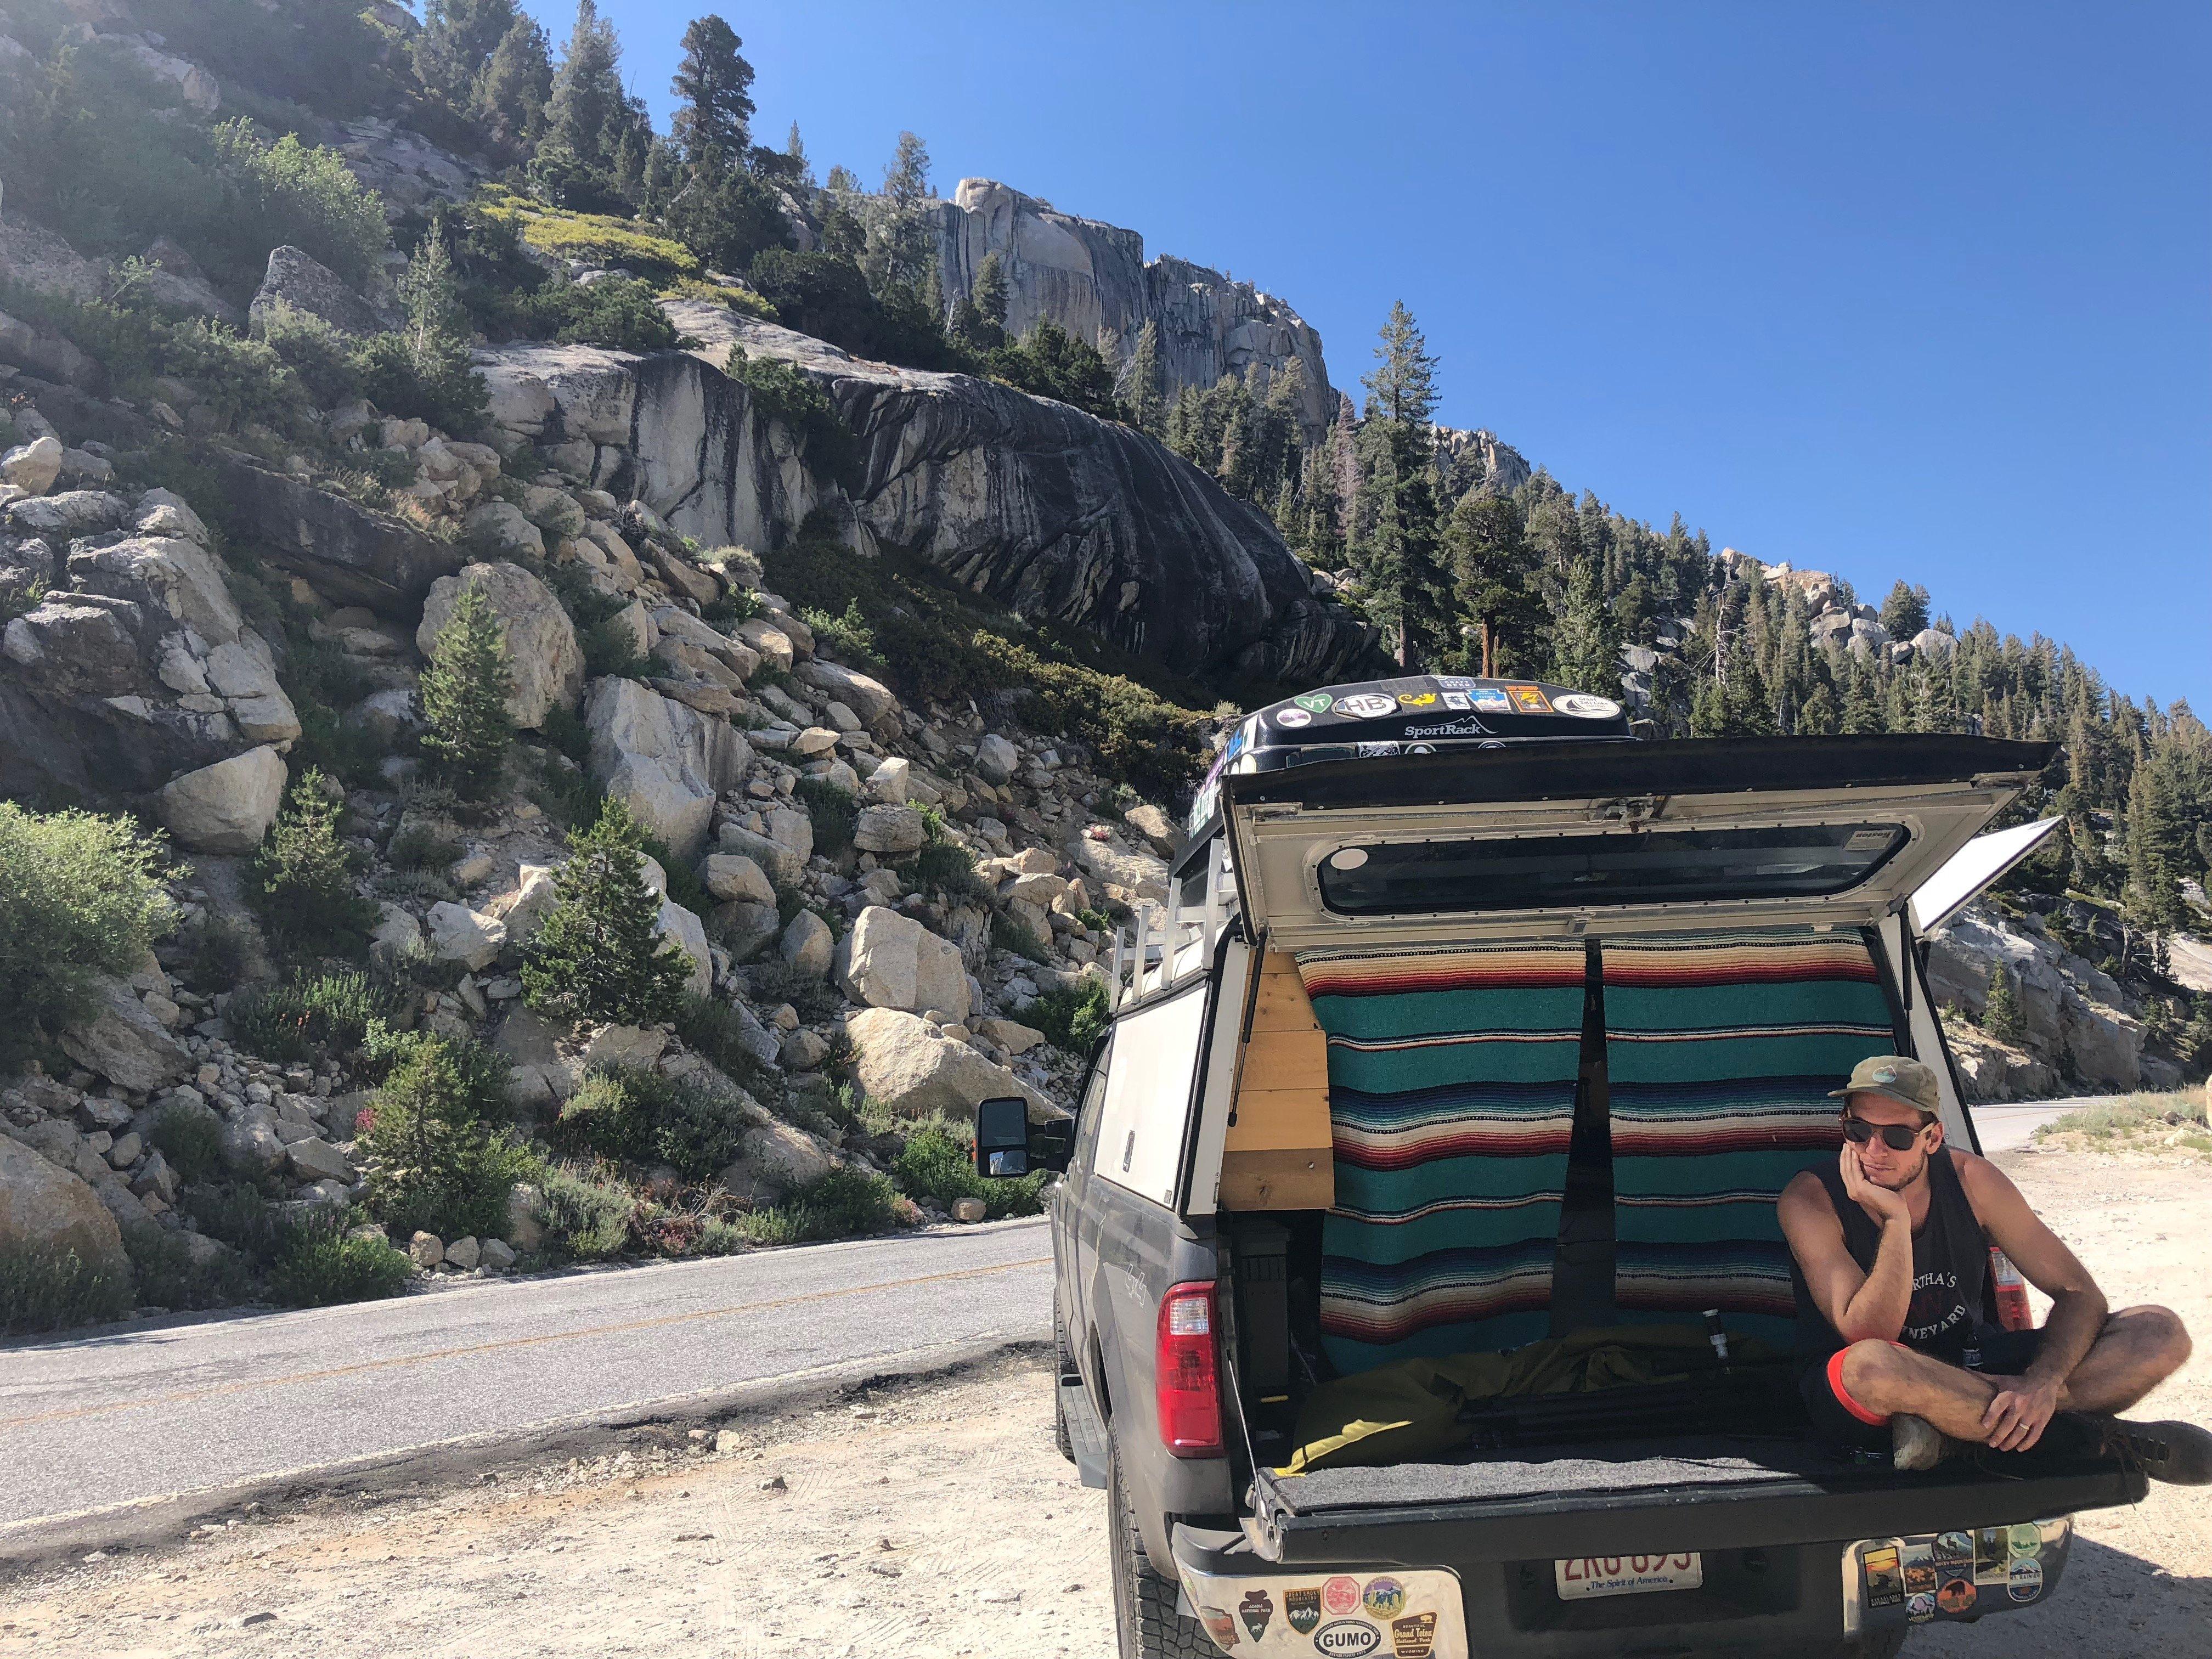 George in Yosemite